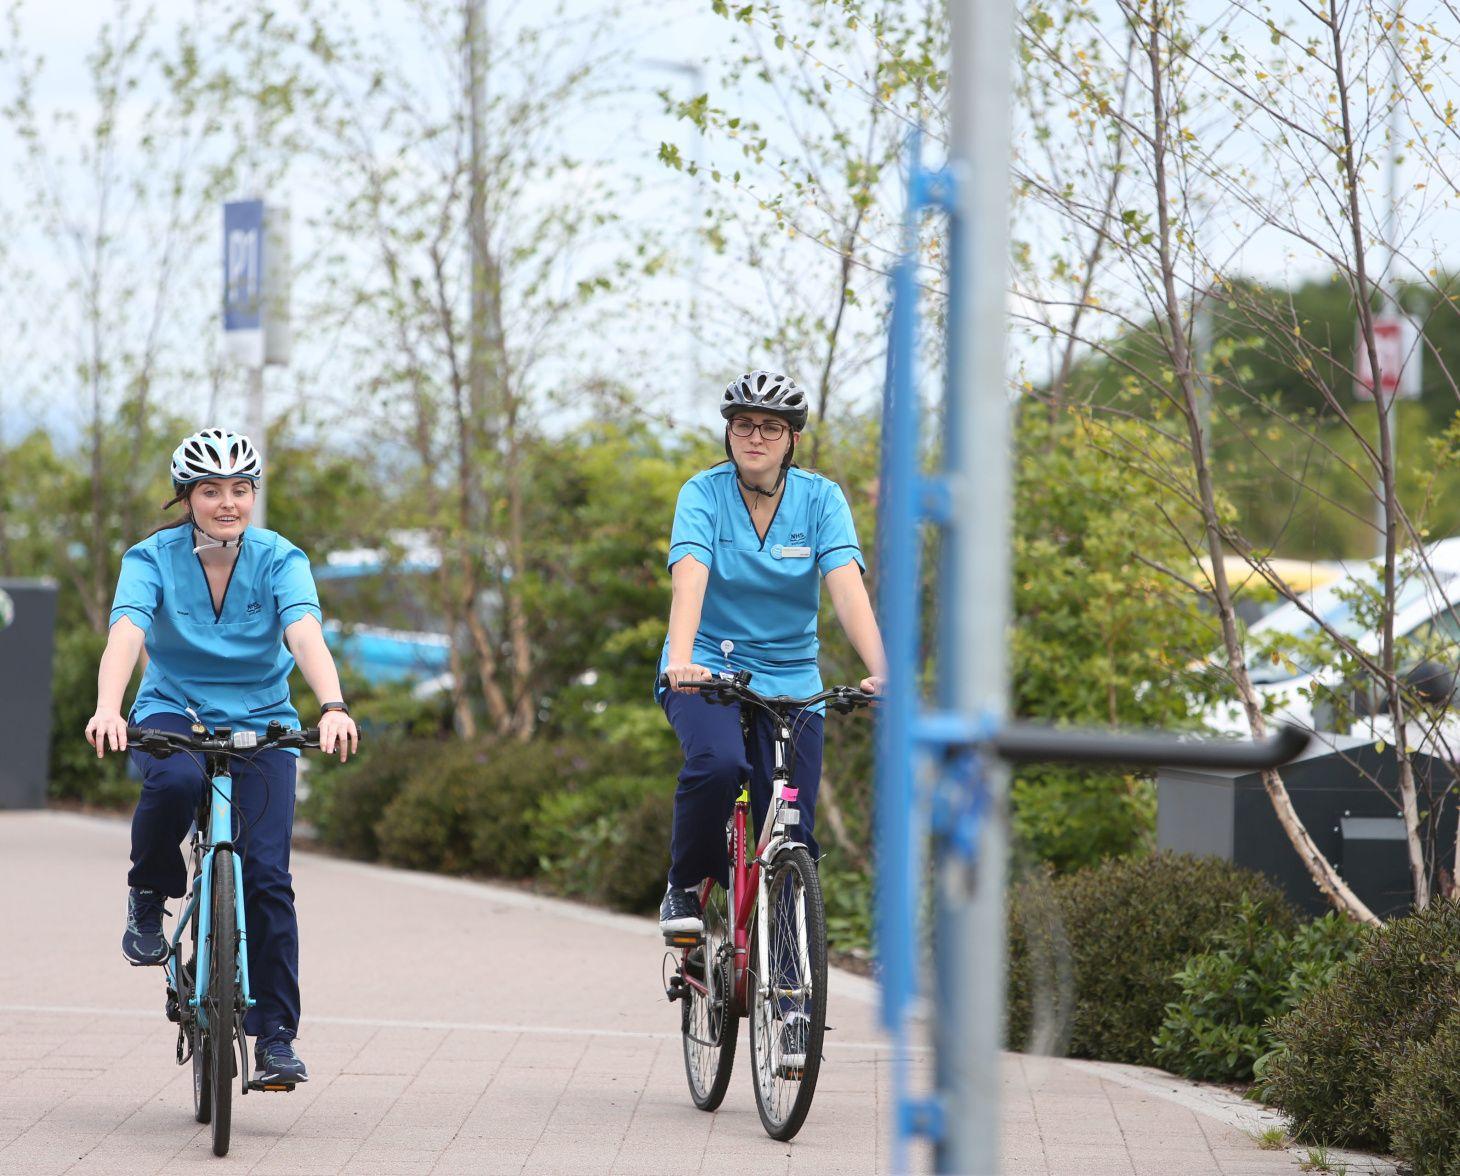 2 hospital staff members riding bikes